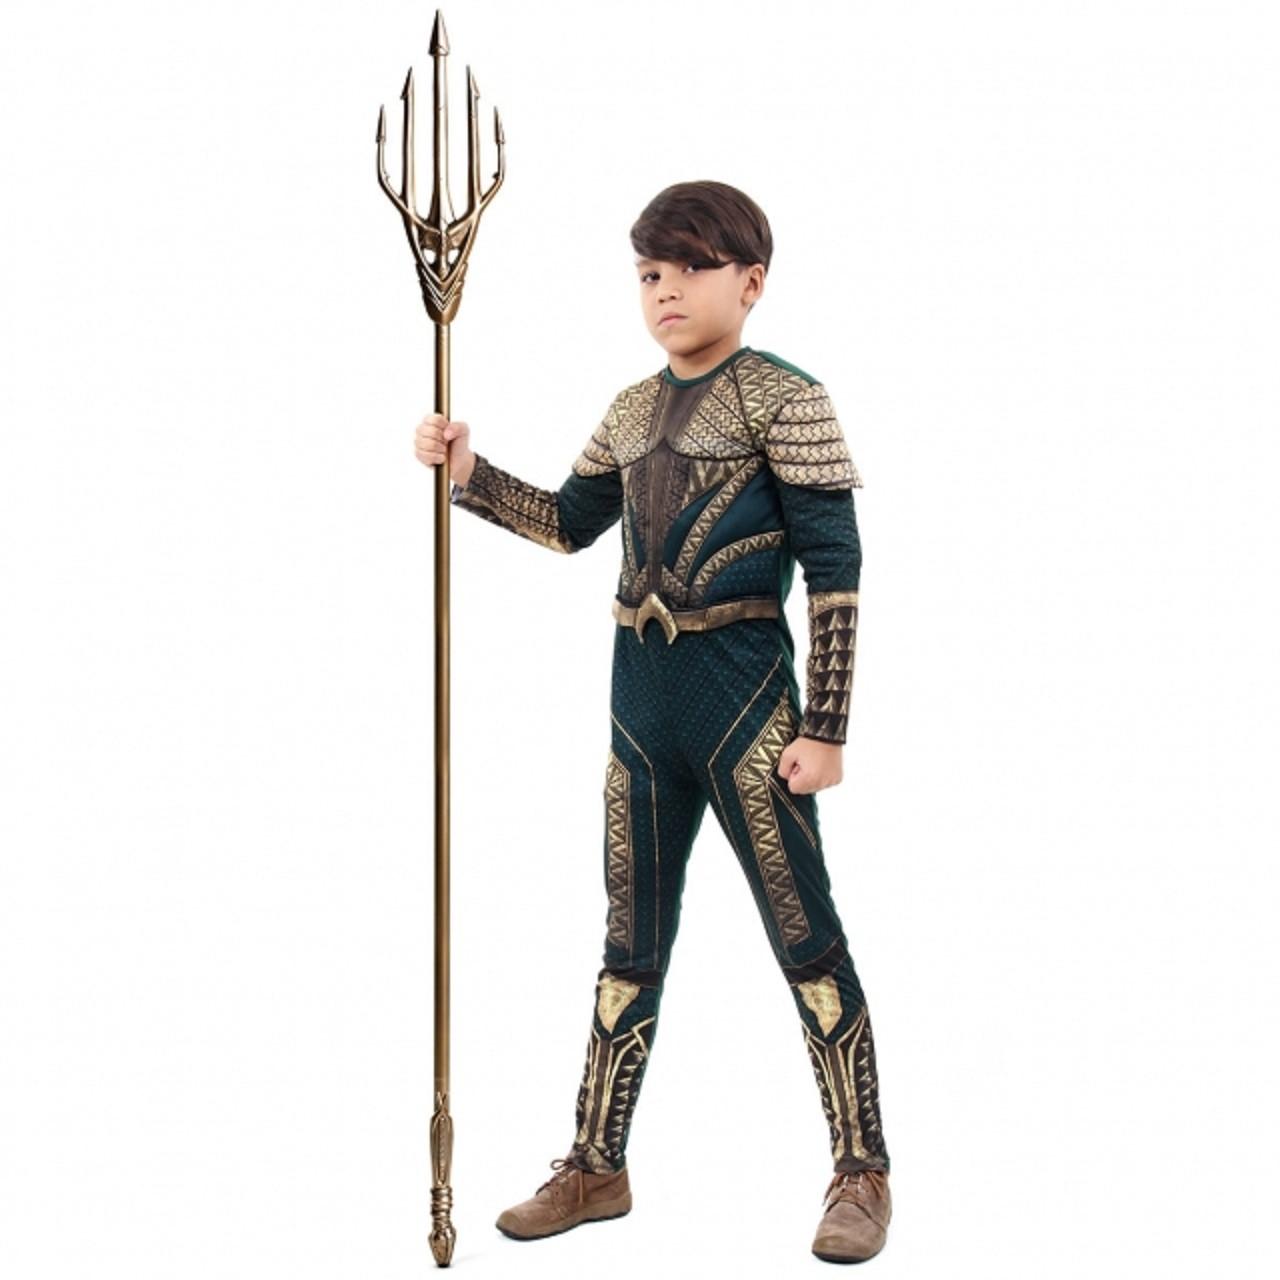 Fantasia Aquaman Infantil Luxo Filme